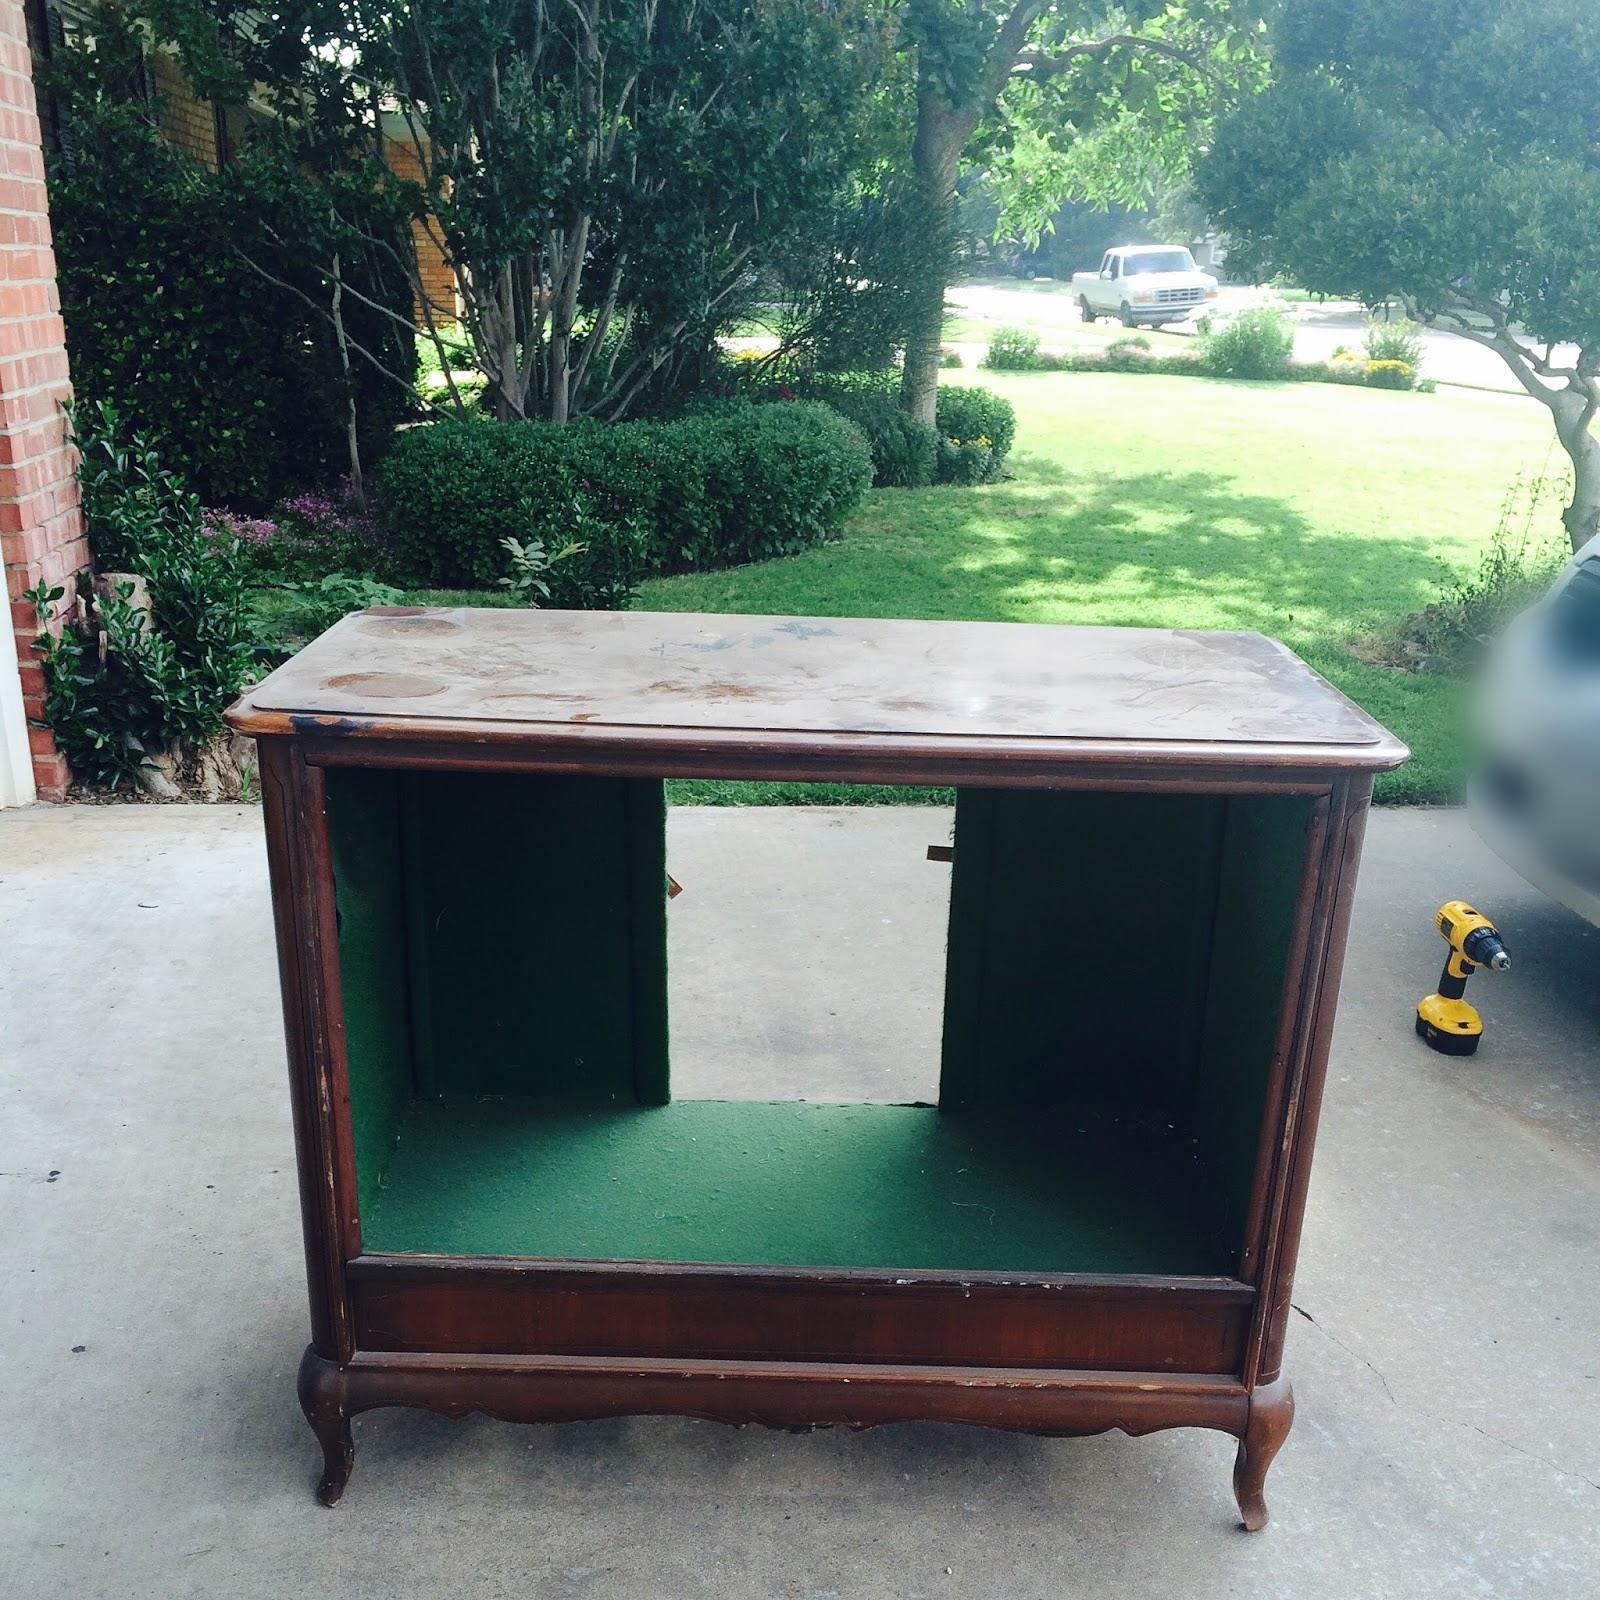 The Peacock Door: Repurpose: TV to Console Cabinet